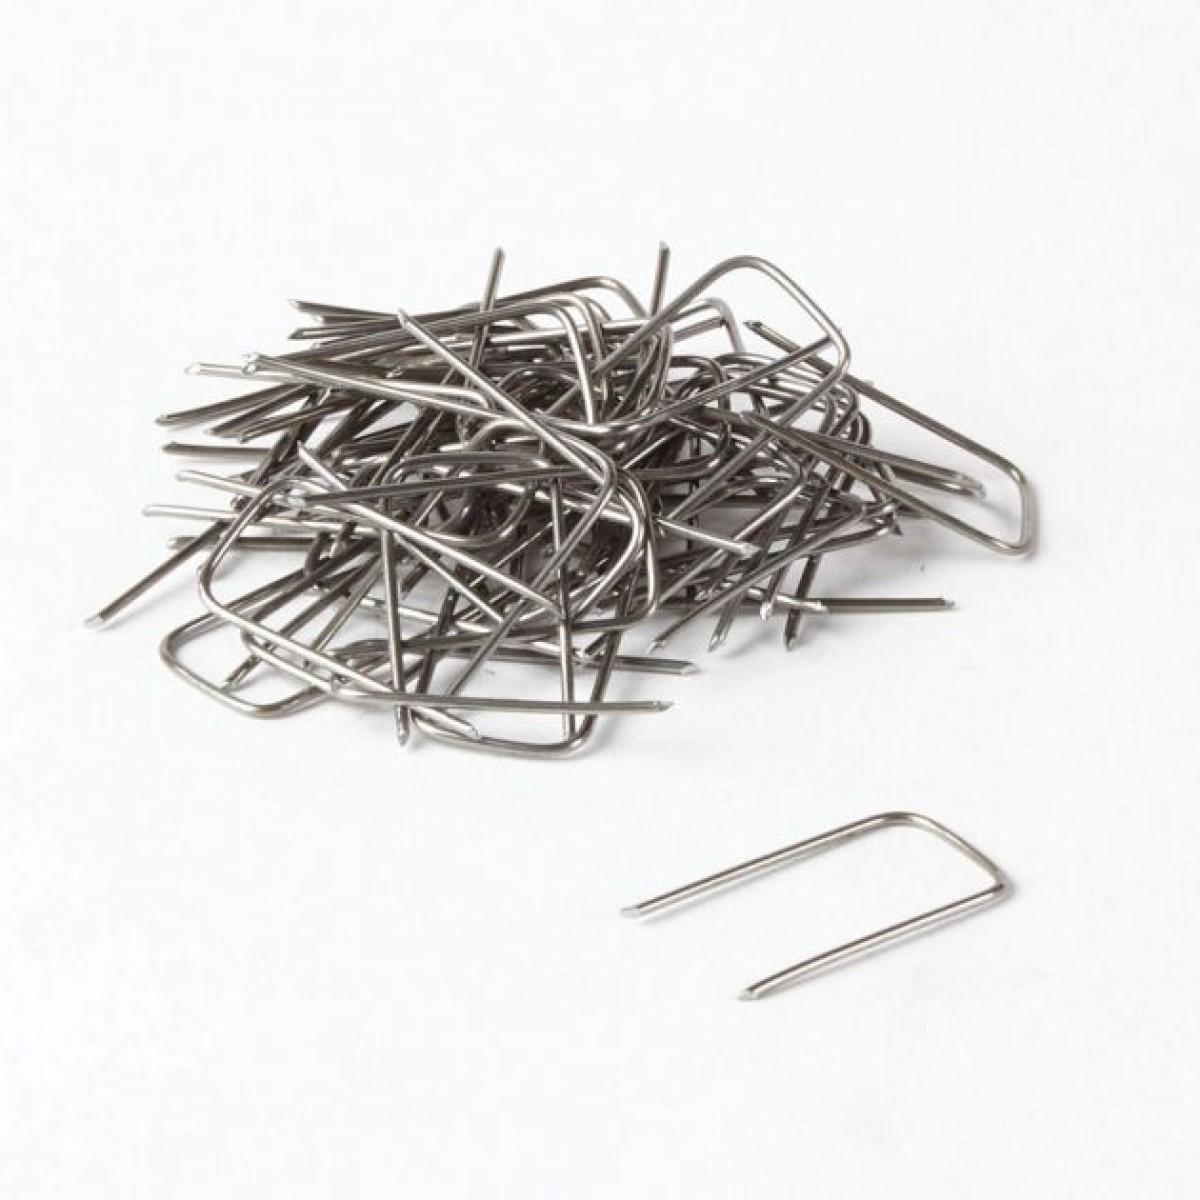 4421 Mossing U Pin 10x70mm 1kg (1 No)